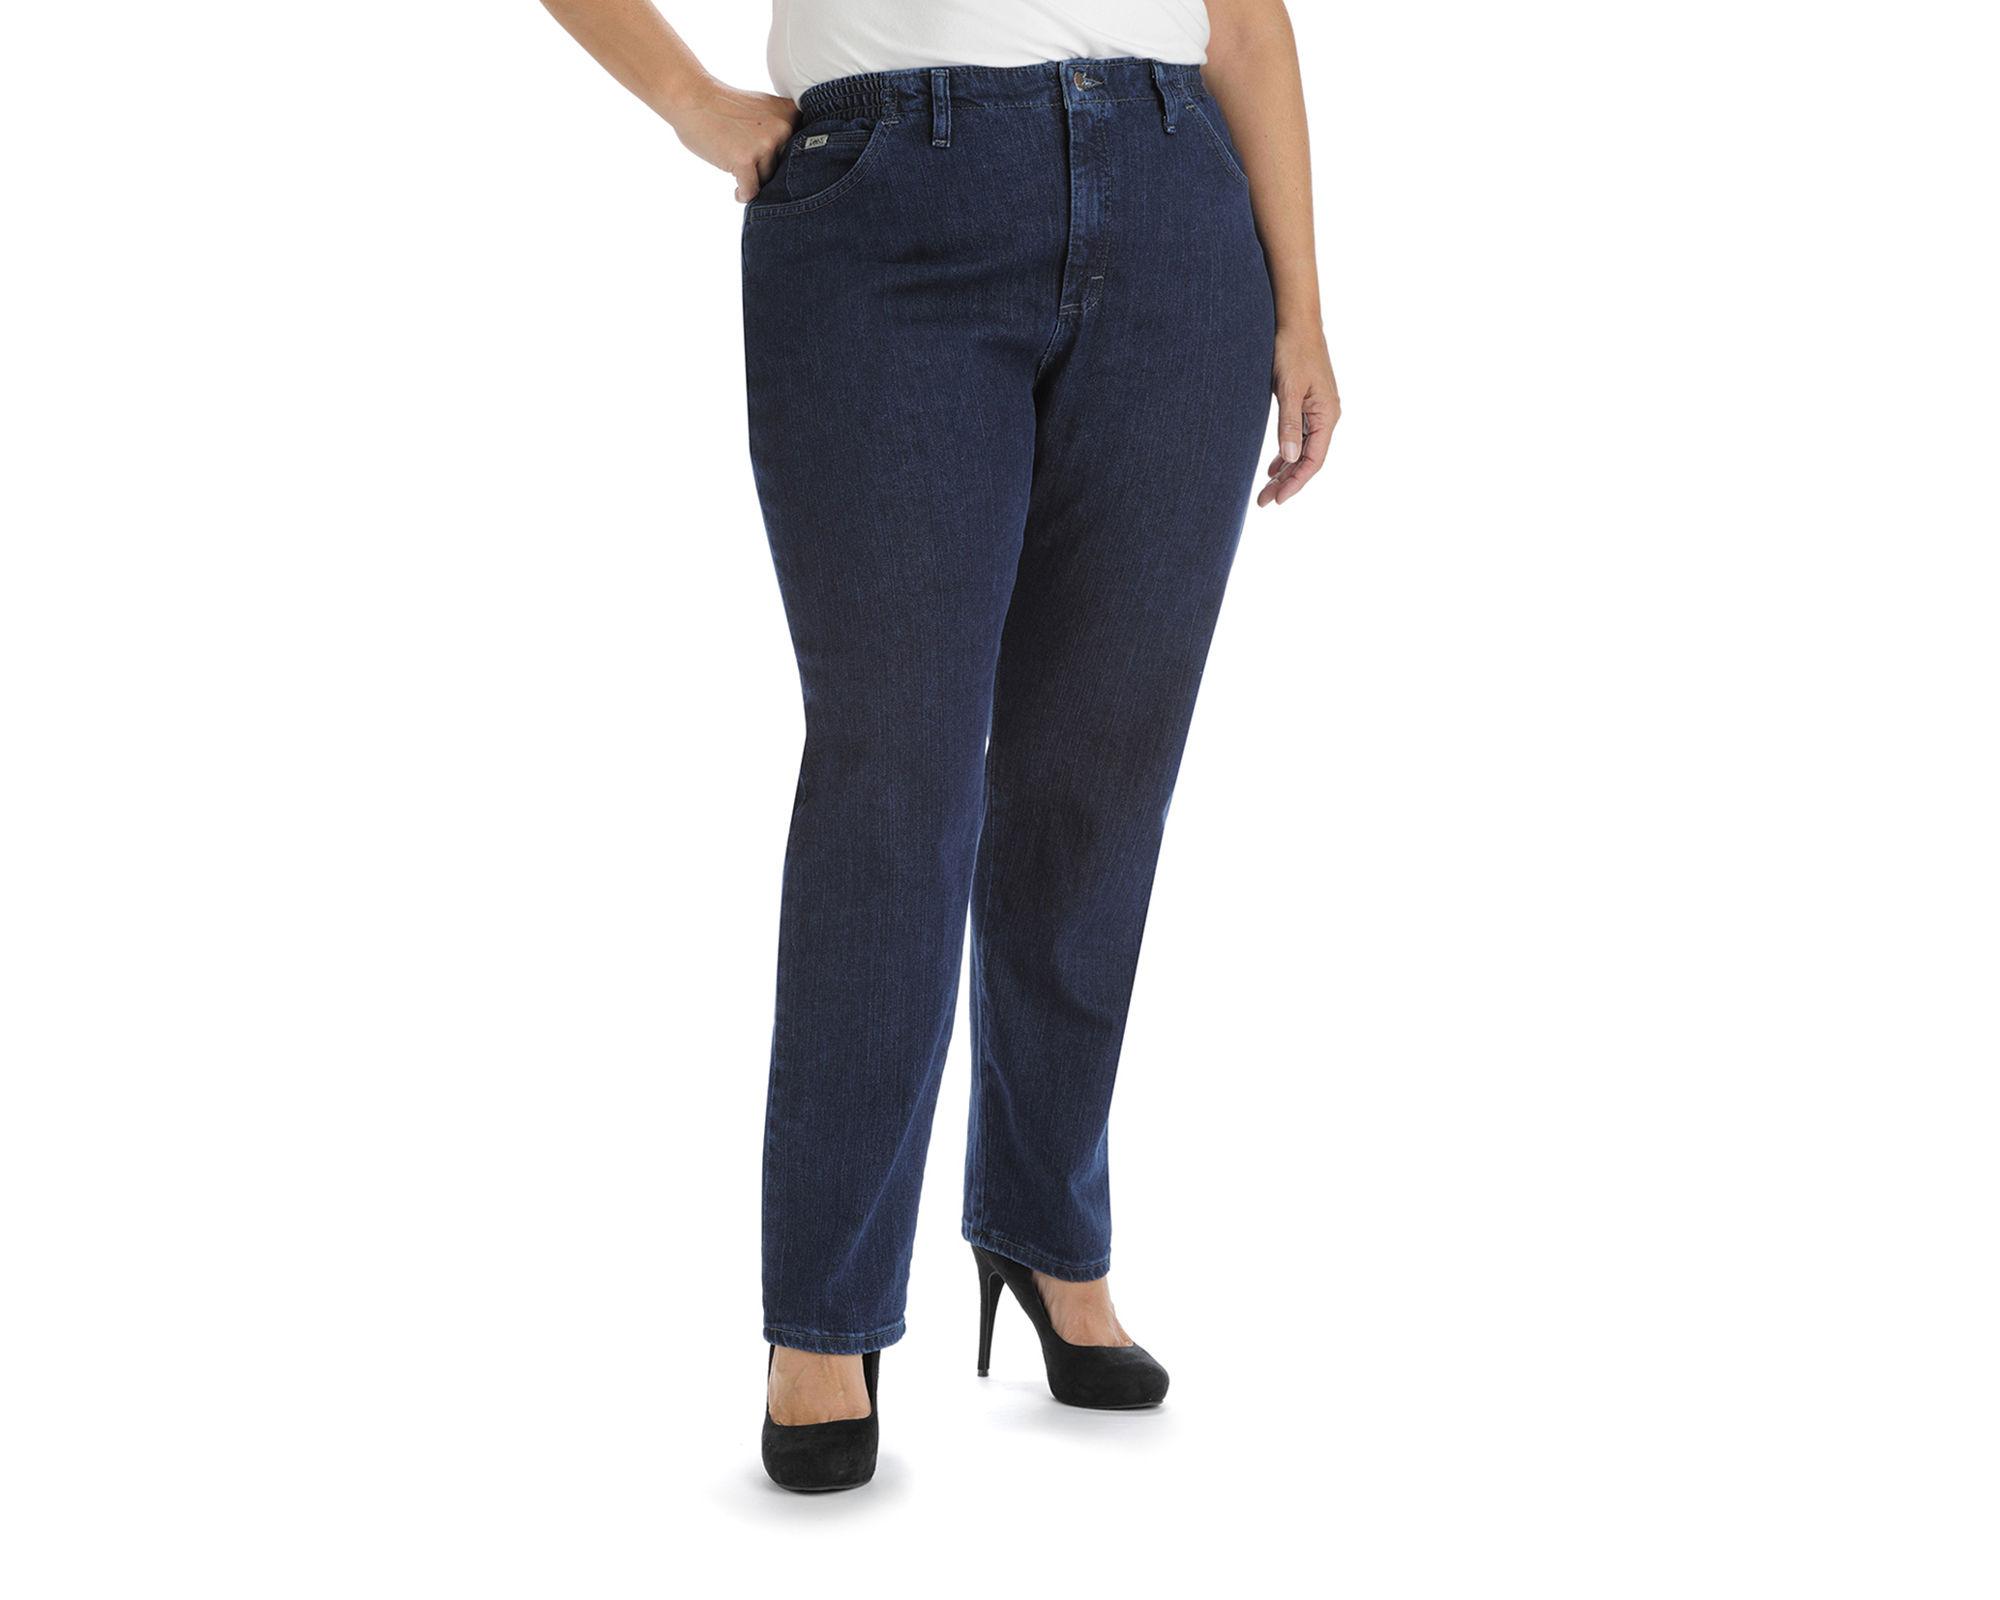 Lee Side-Elastic Jeans - Plus